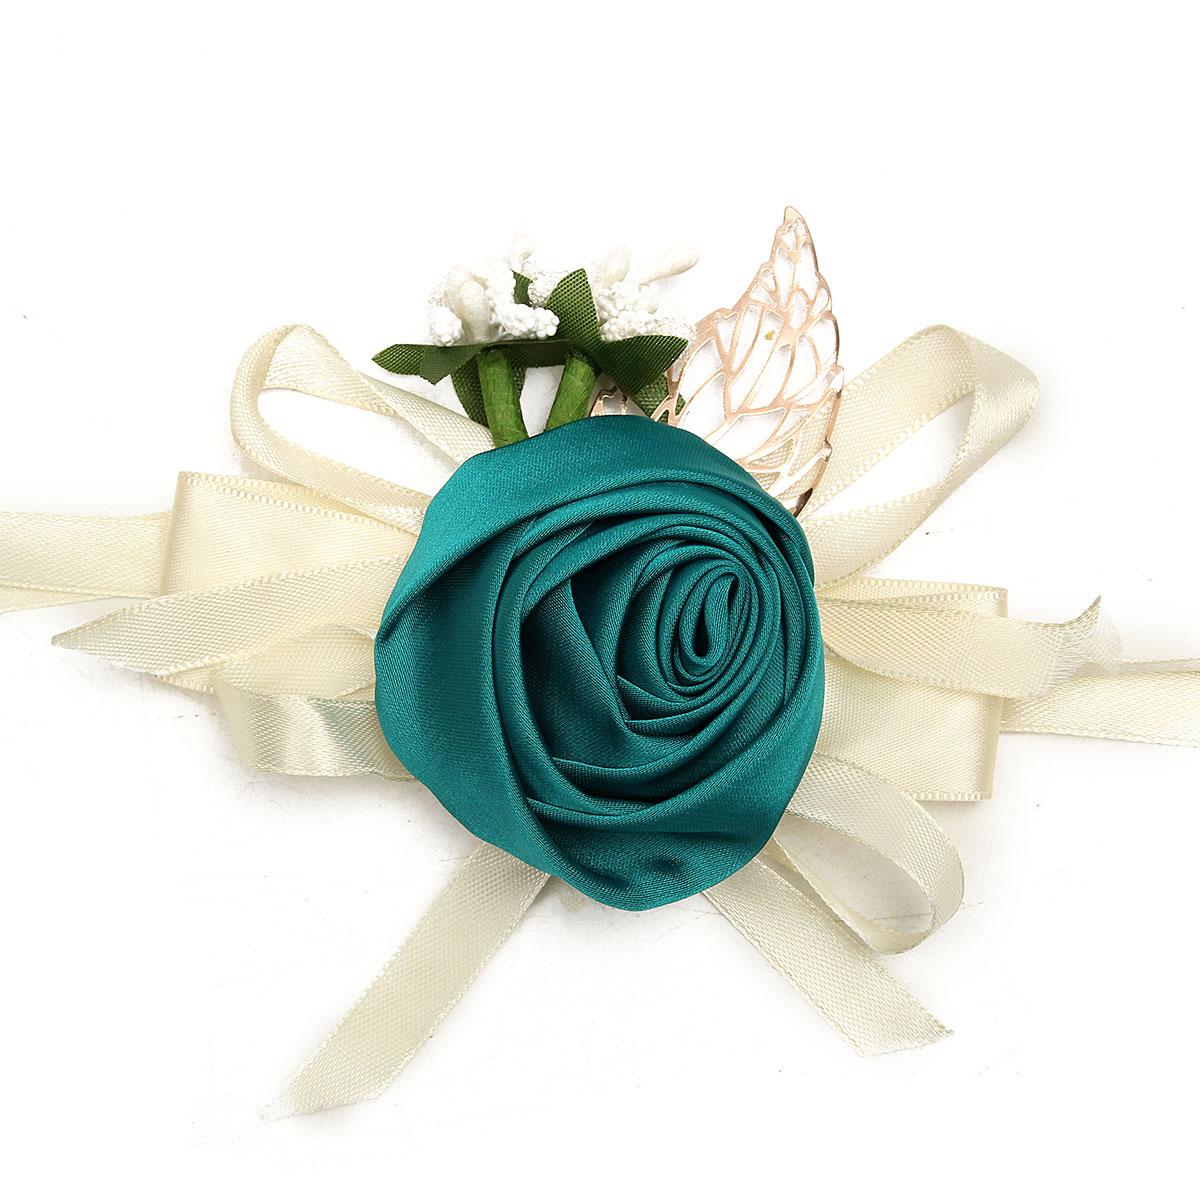 Bridal Rose Ribbon Wrist Flower Bridesmaid Corsage Bracelet Wedding Party Decoration